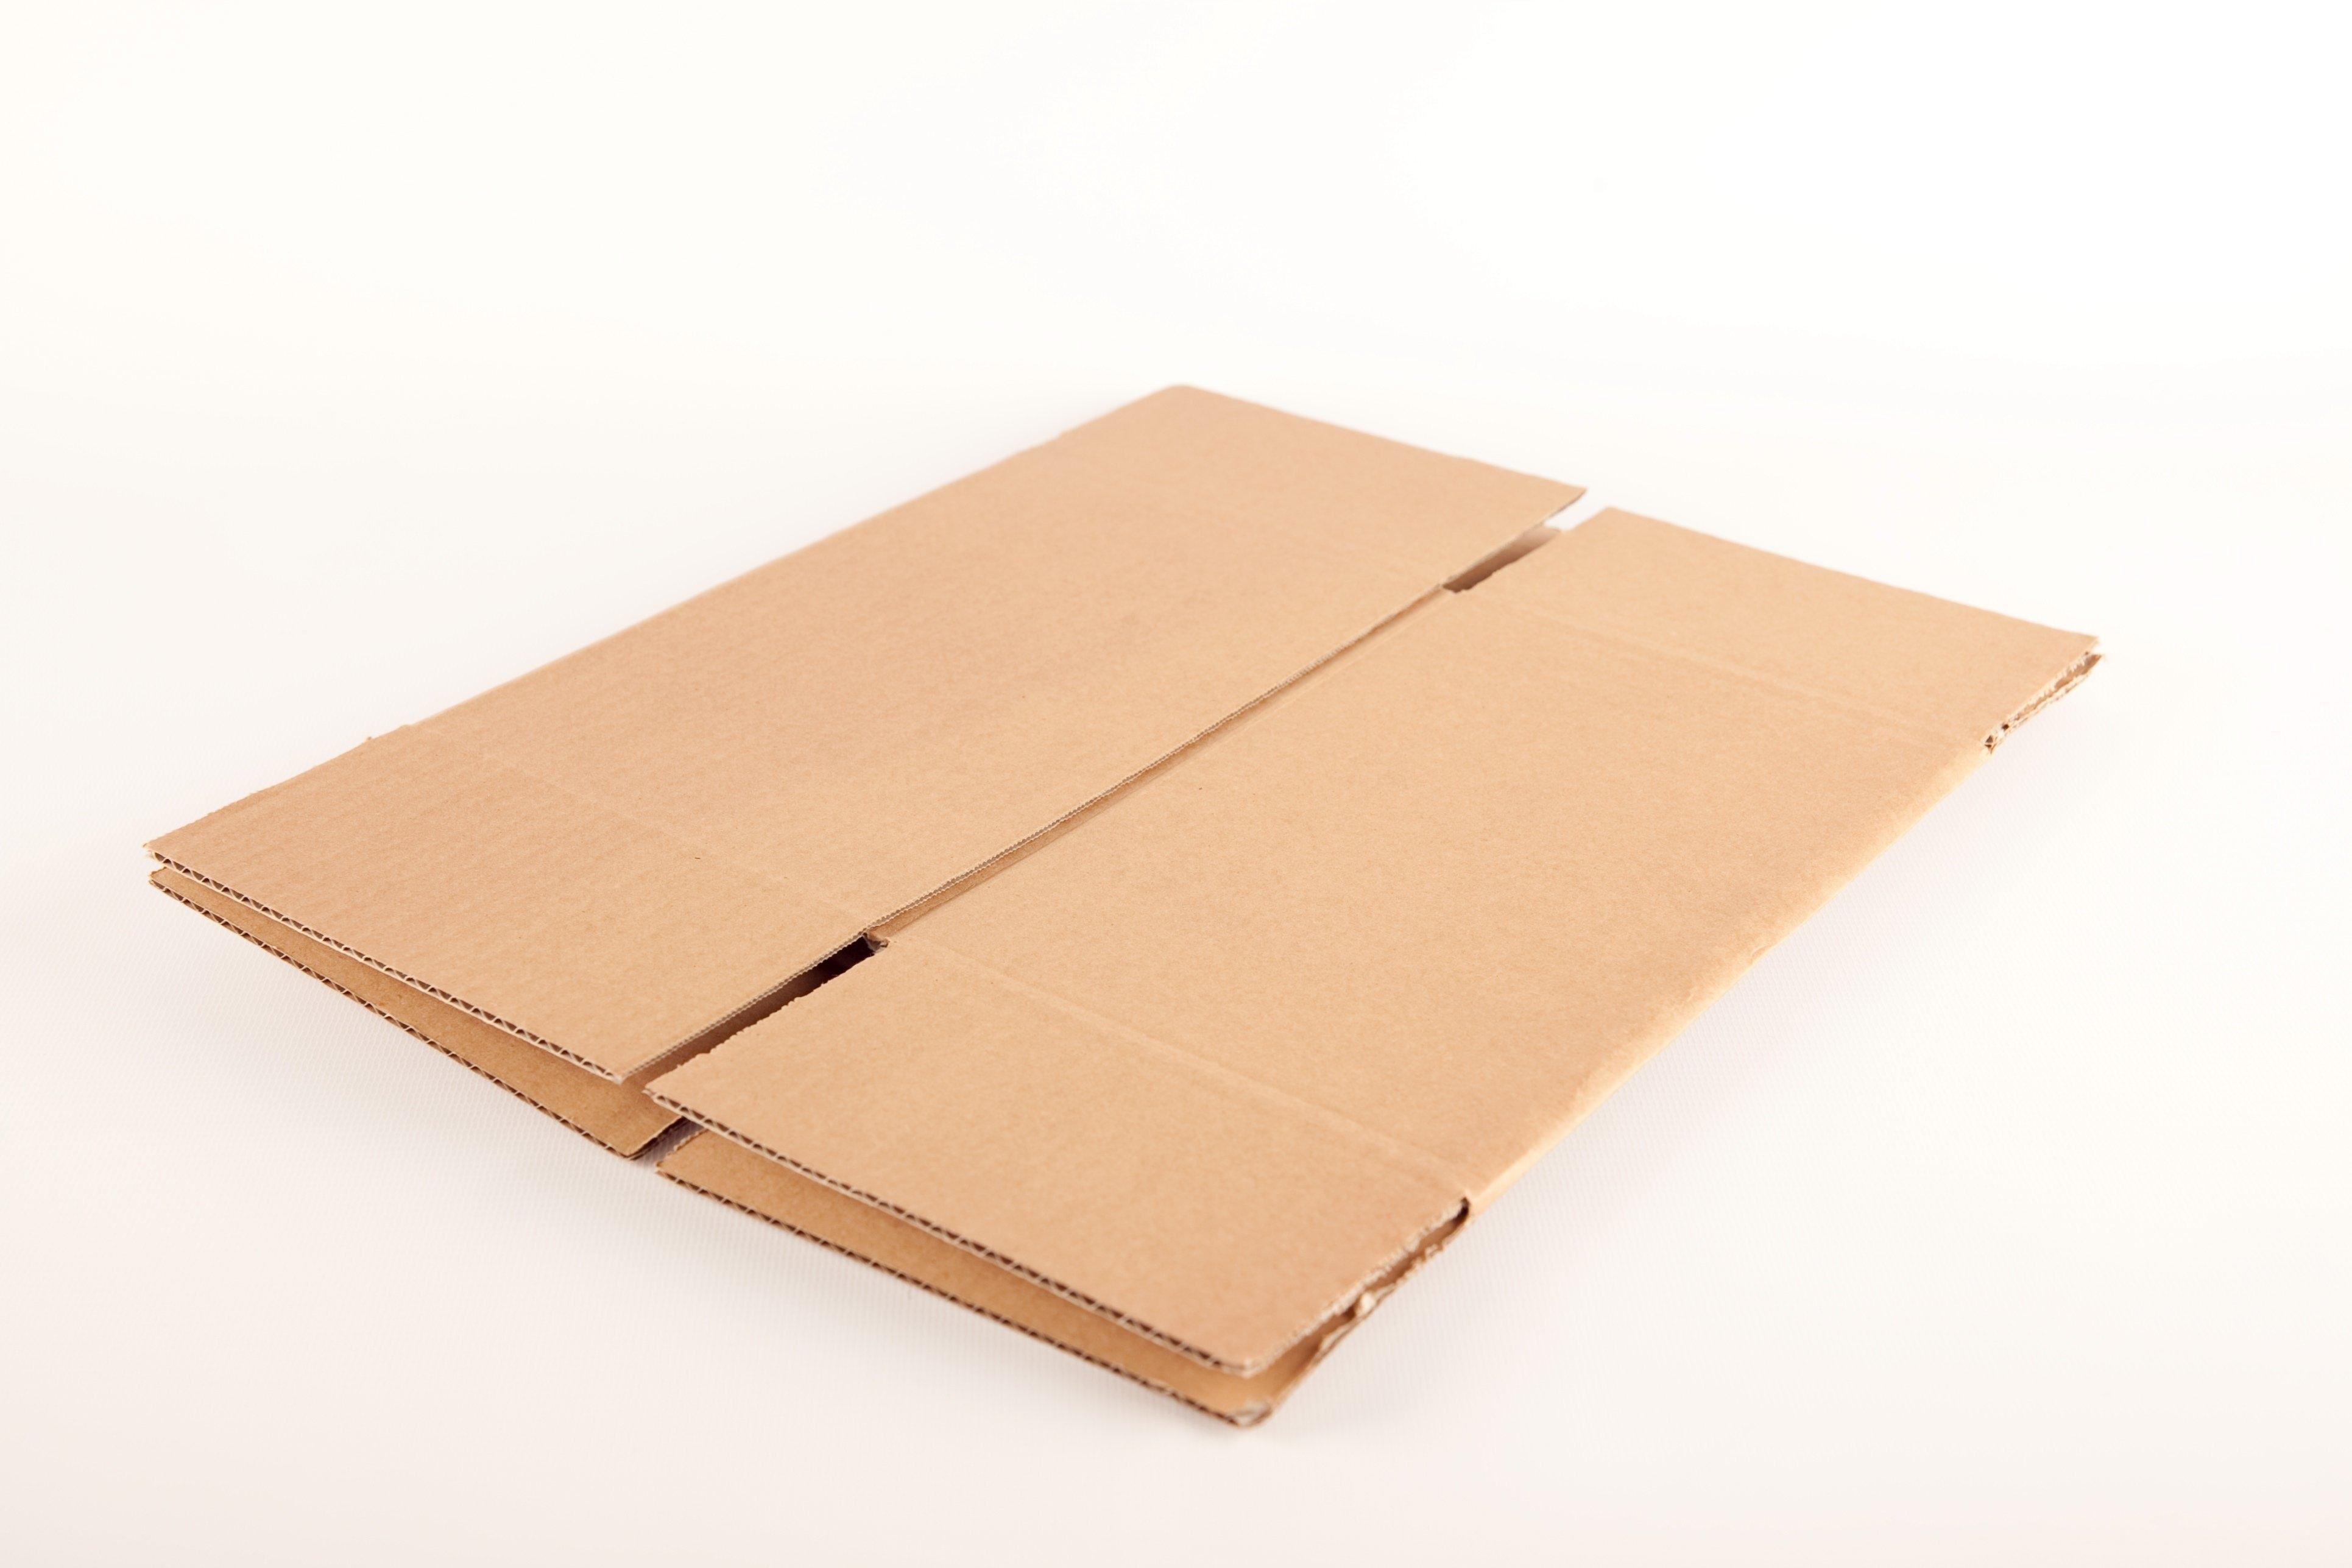 305 x 305 x 152mm Single Wall Cardboard Boxes - 3